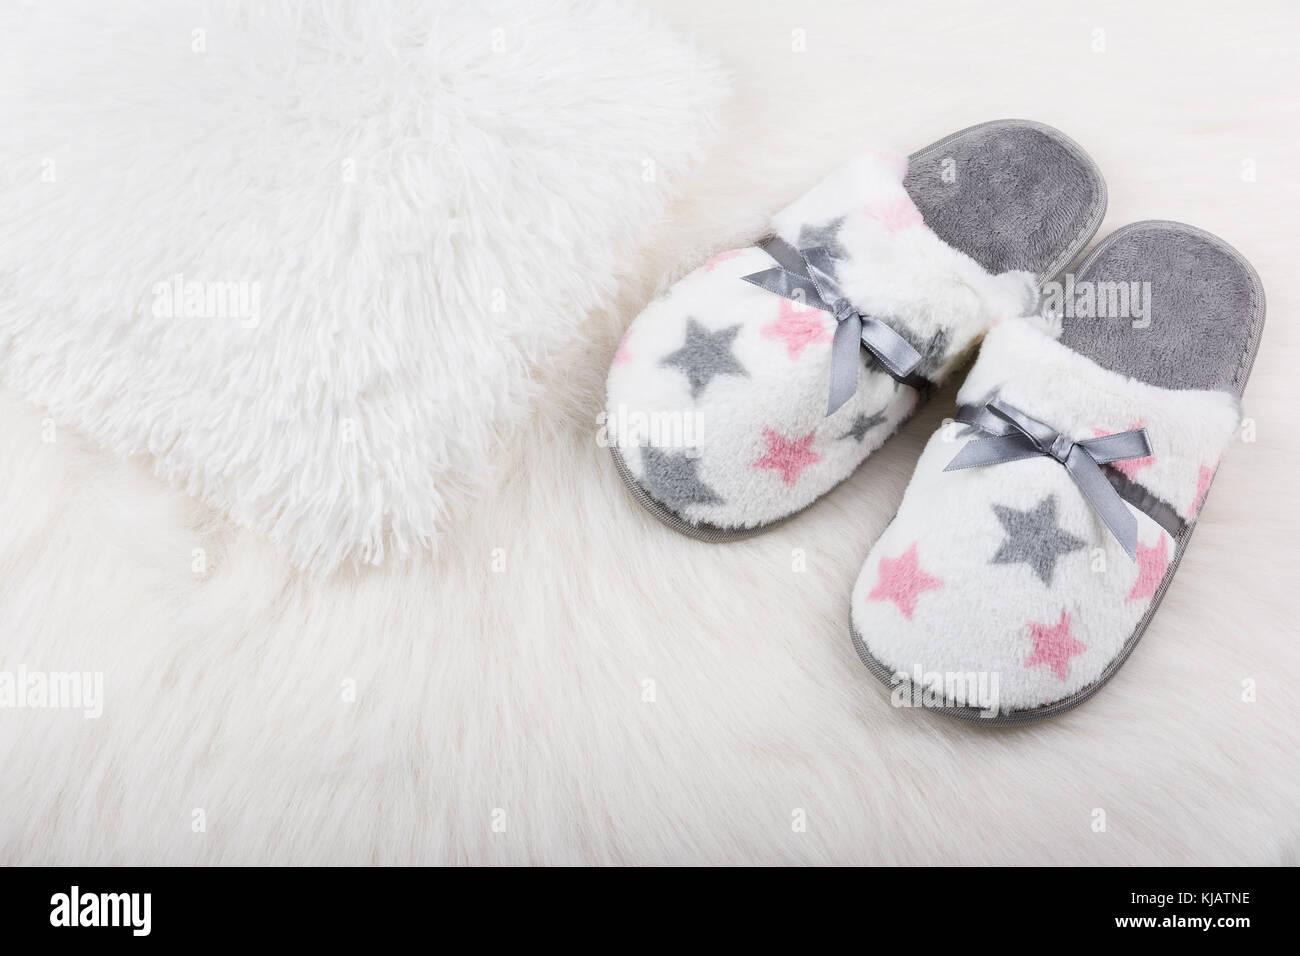 new products be44b c1f1b Coppia di donne calde pantofole sul bianco tappeto peloso ...